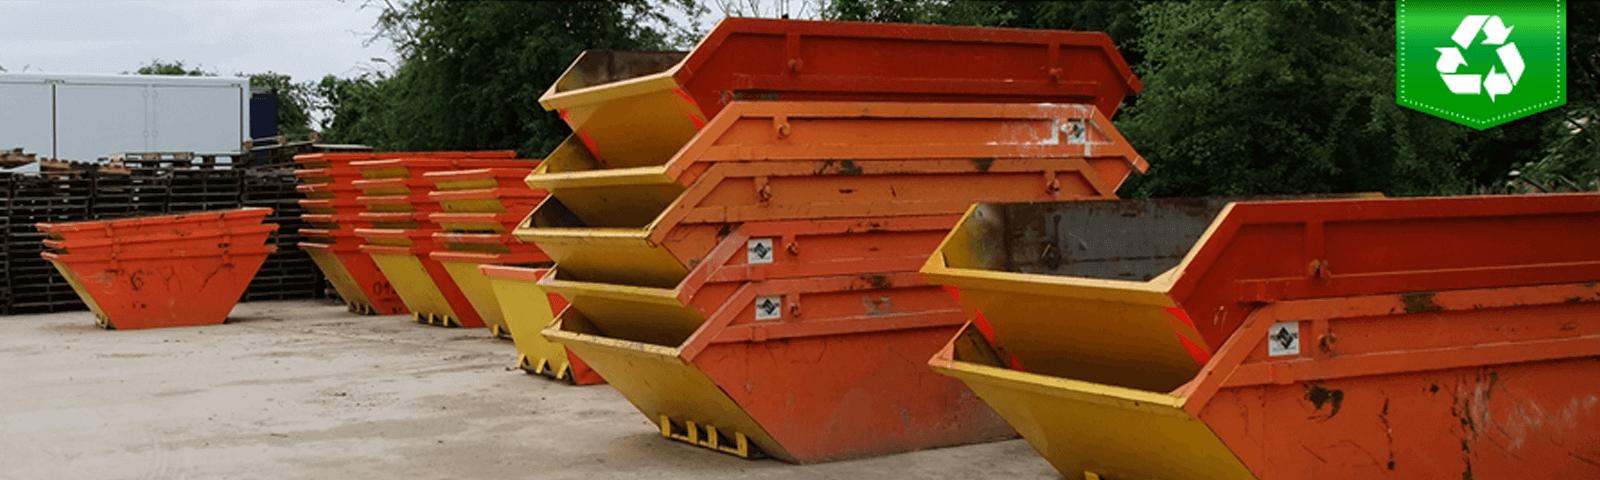 Solihull-stacked-up-skip-1-1